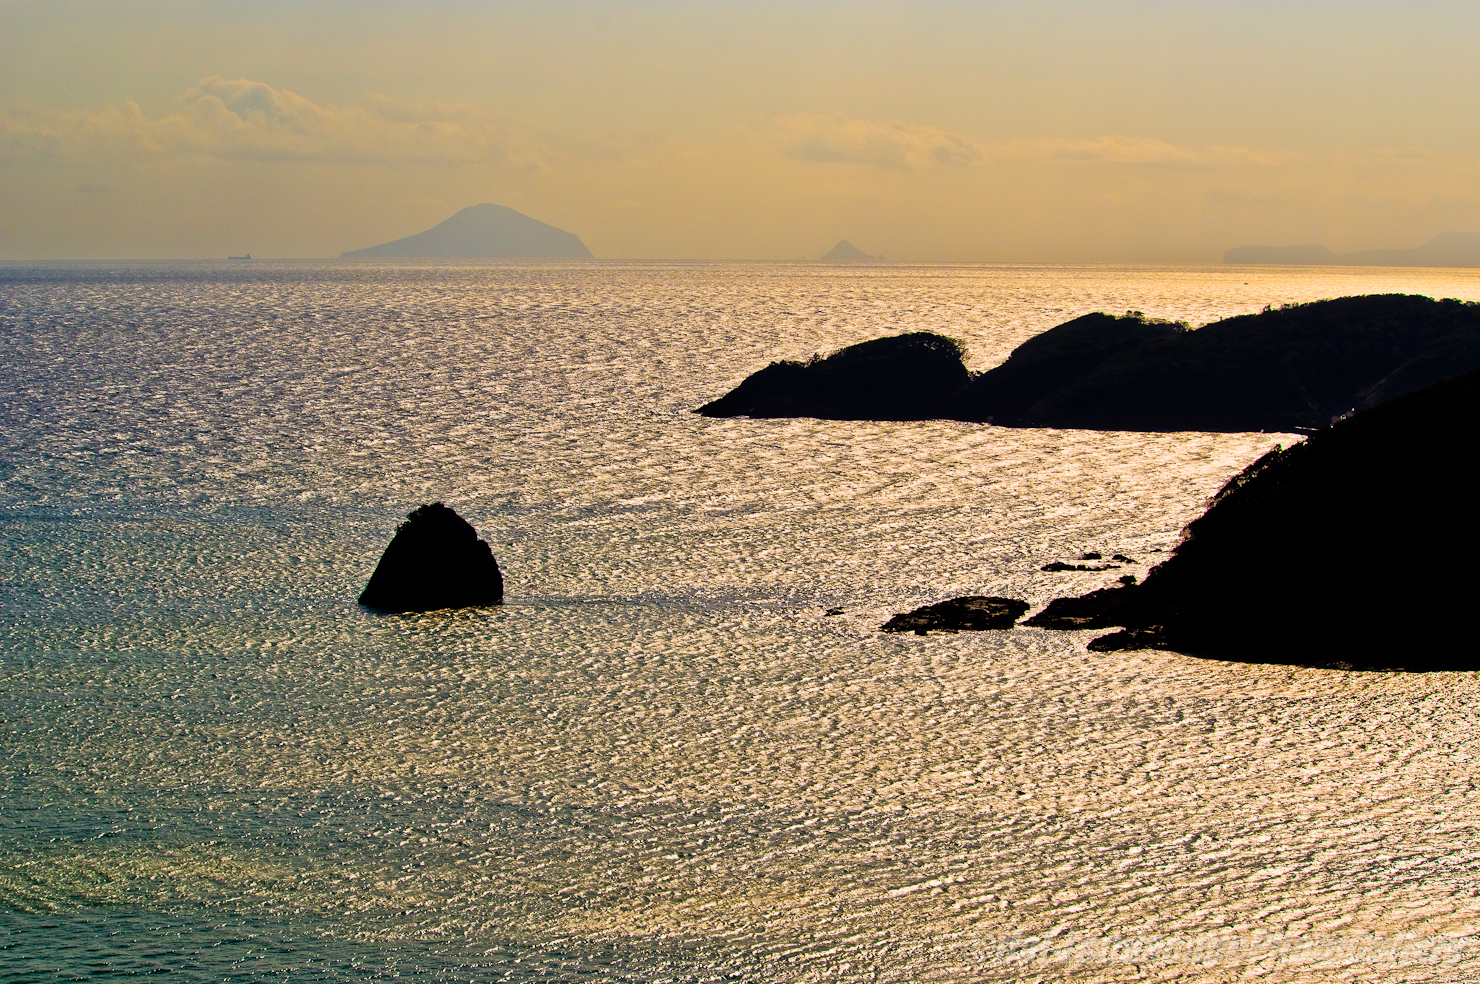 朝日輝く外浦湾